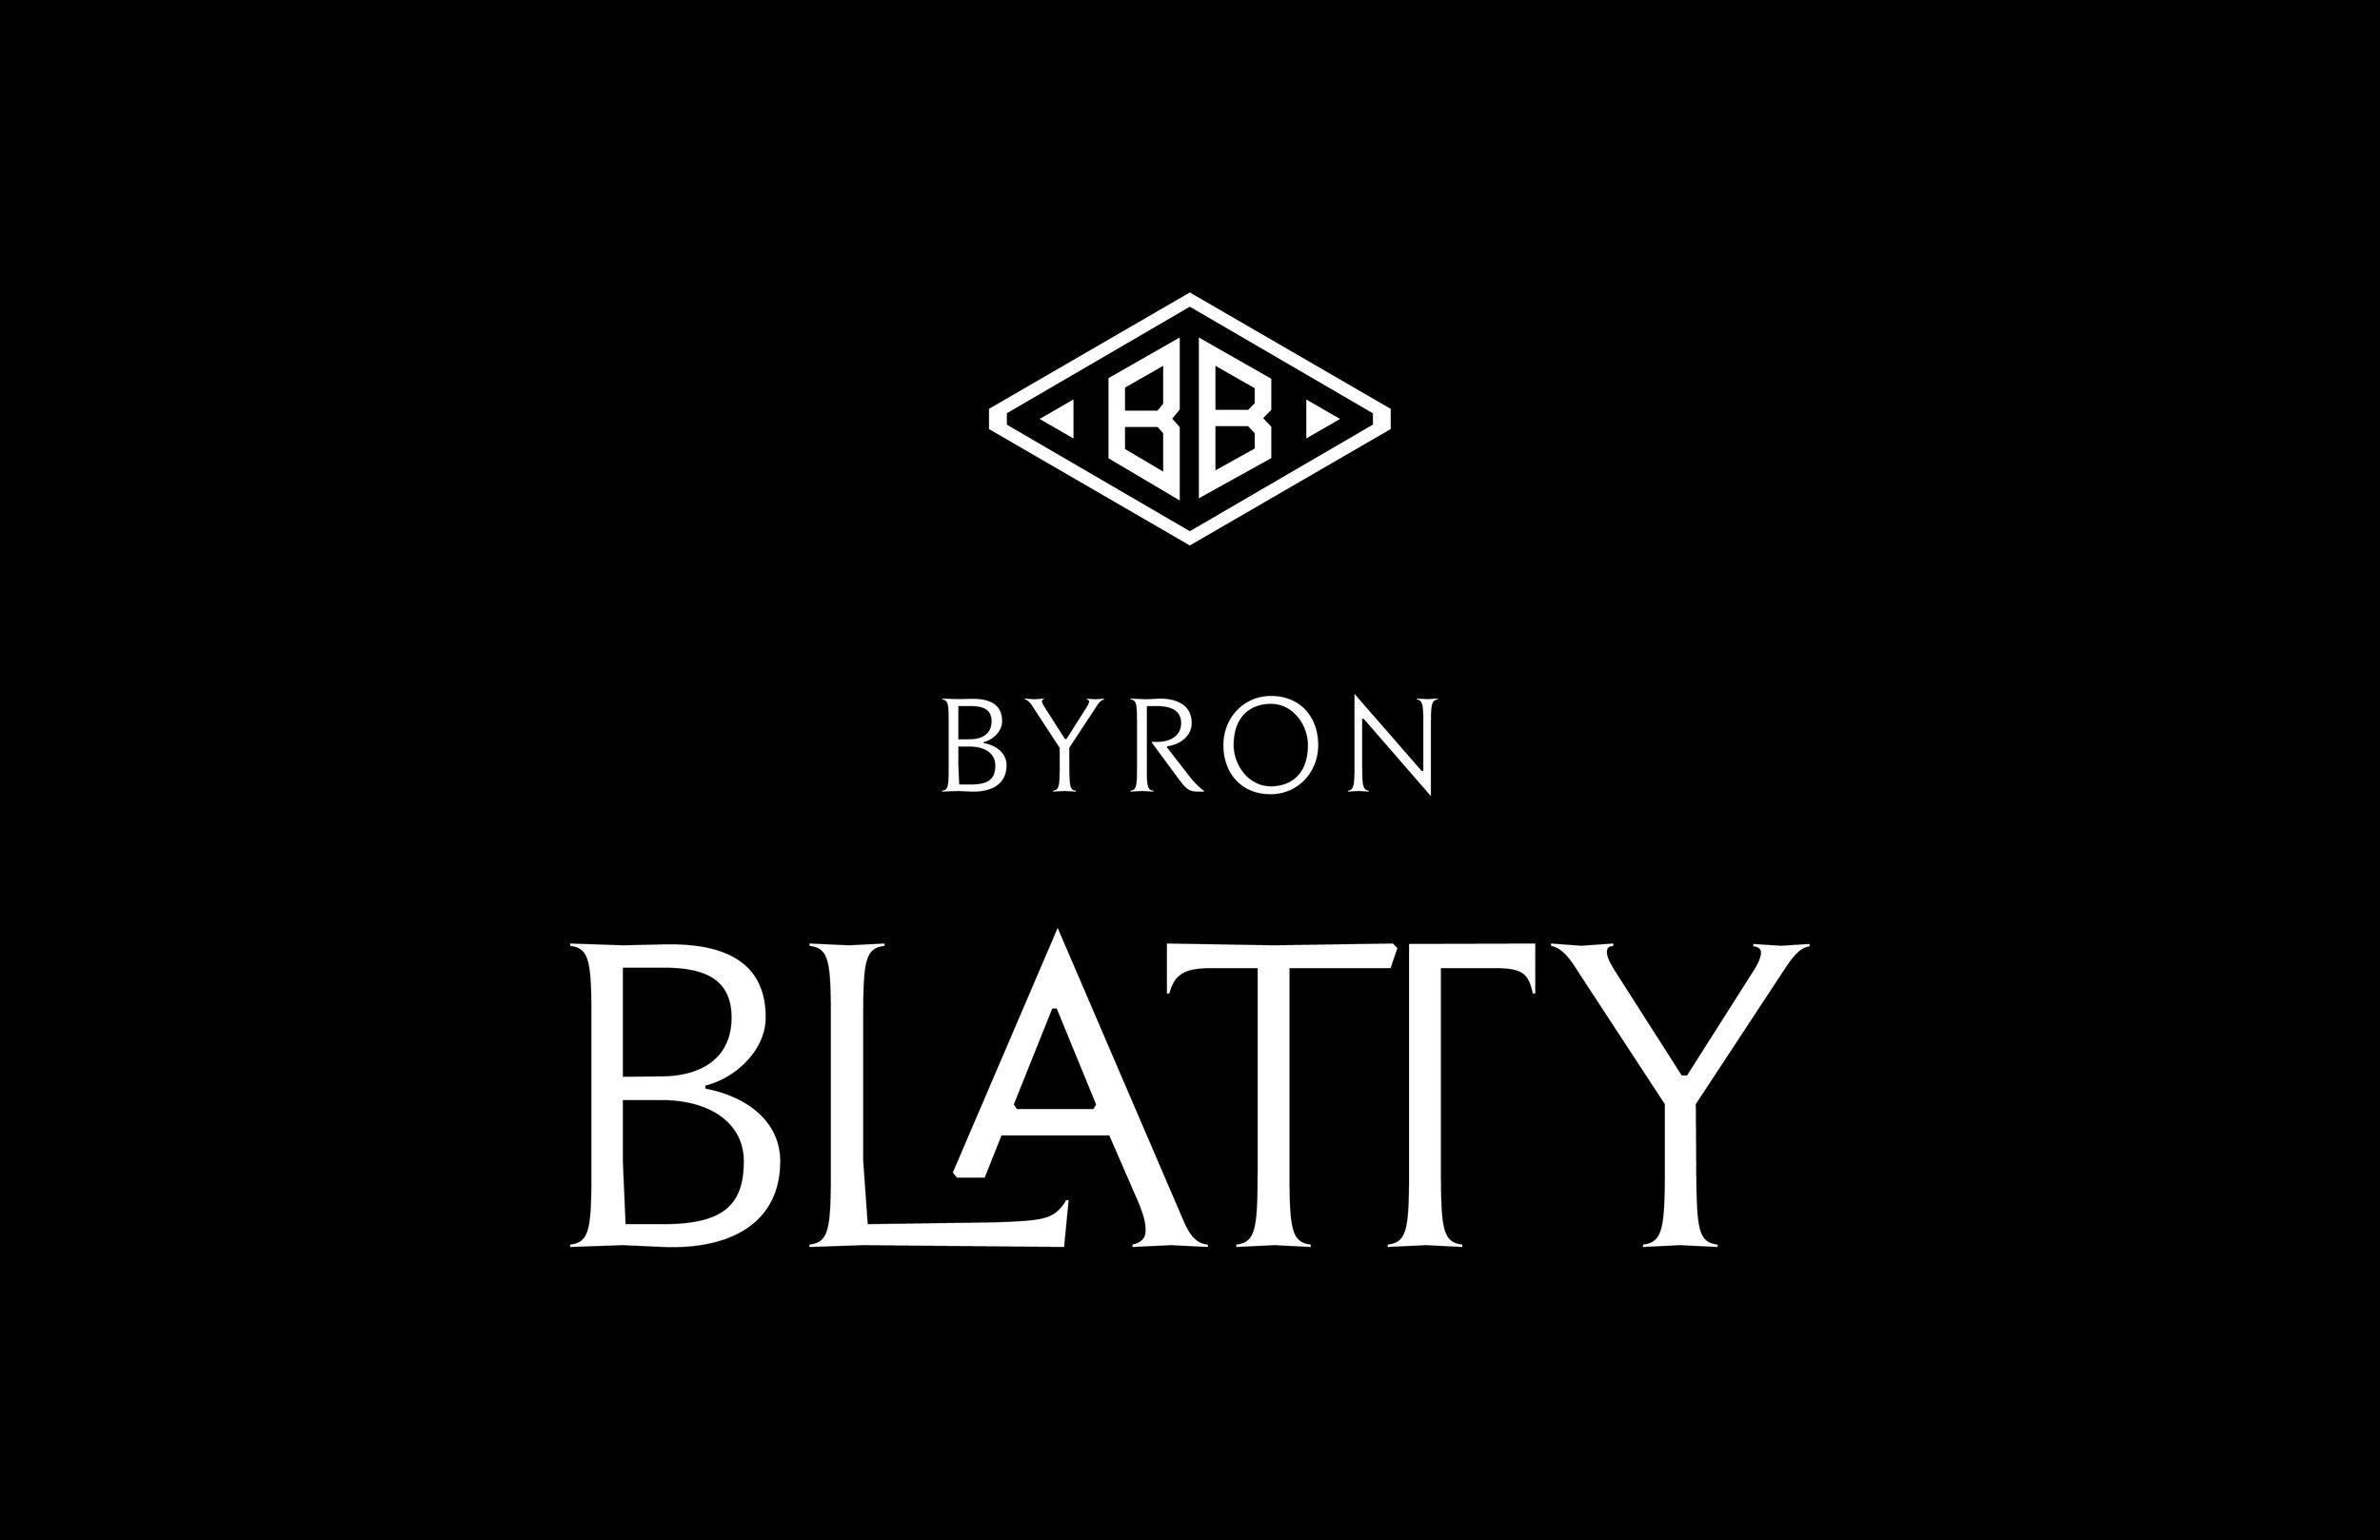 Byron-Blatty_Logo_lockups_logomark.jpg